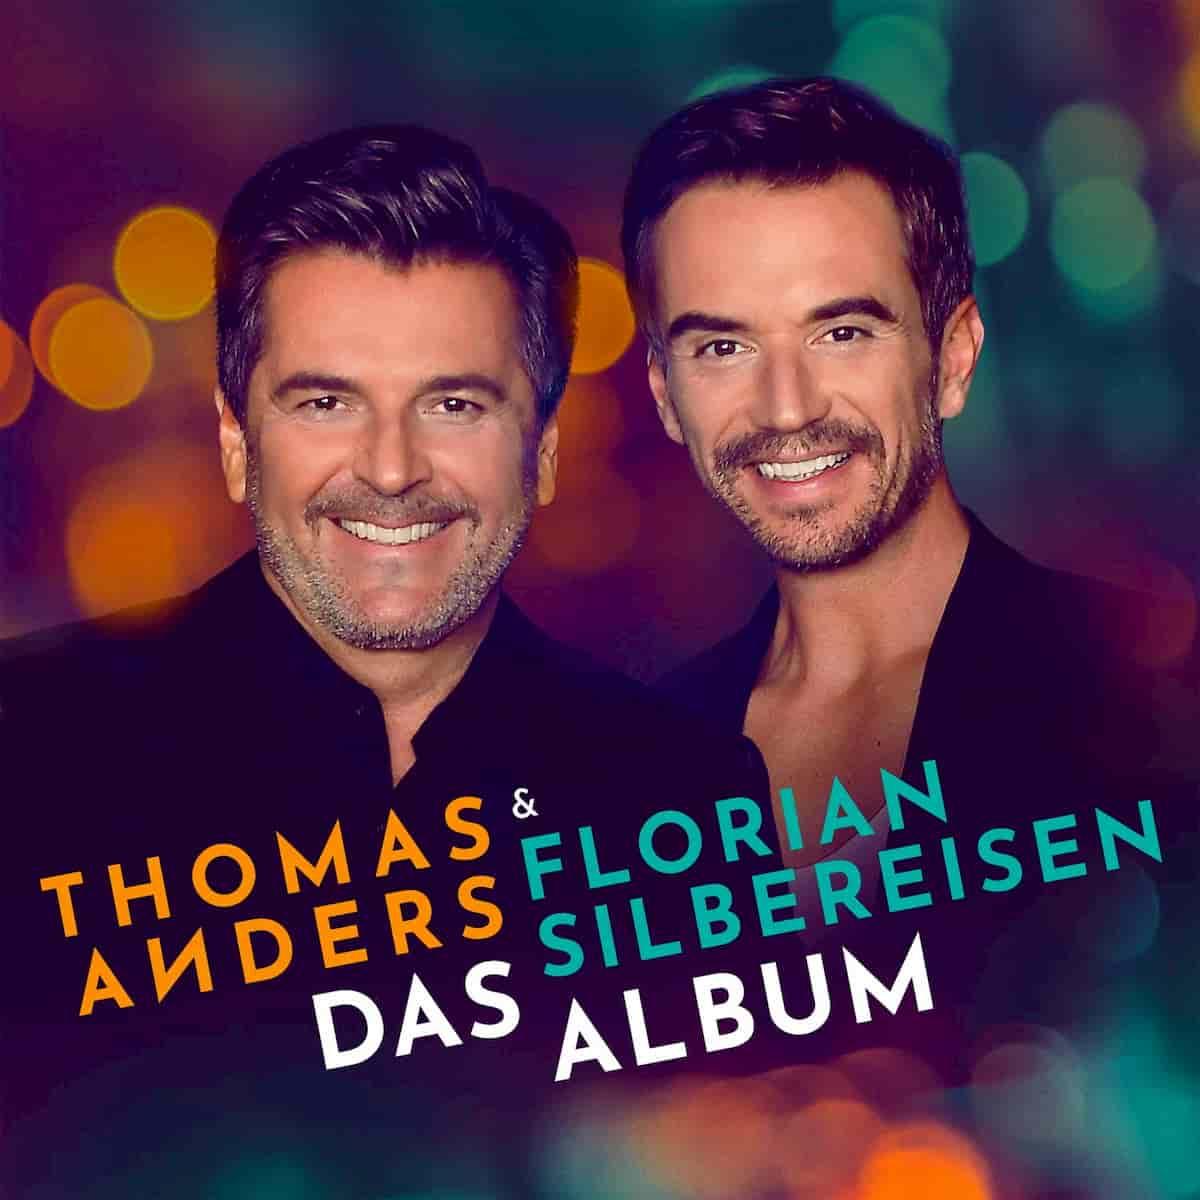 Florian Silbereisen und Thomas Anders - Das Album 2020